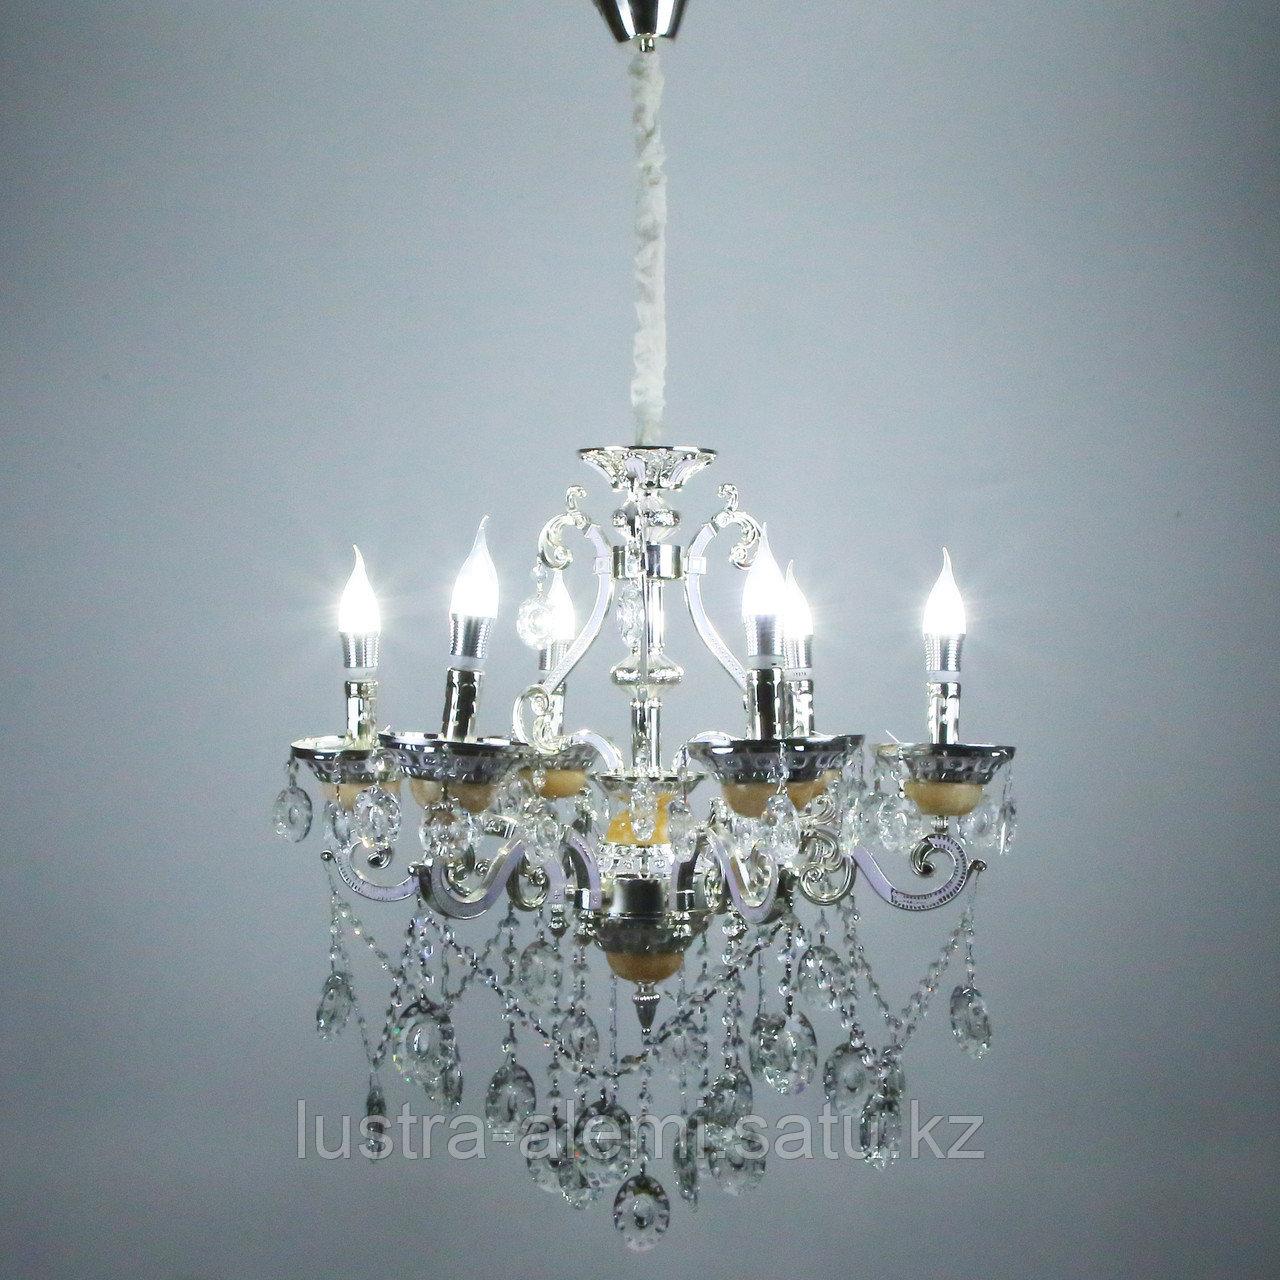 Люстра Классика 8825/6 Silver